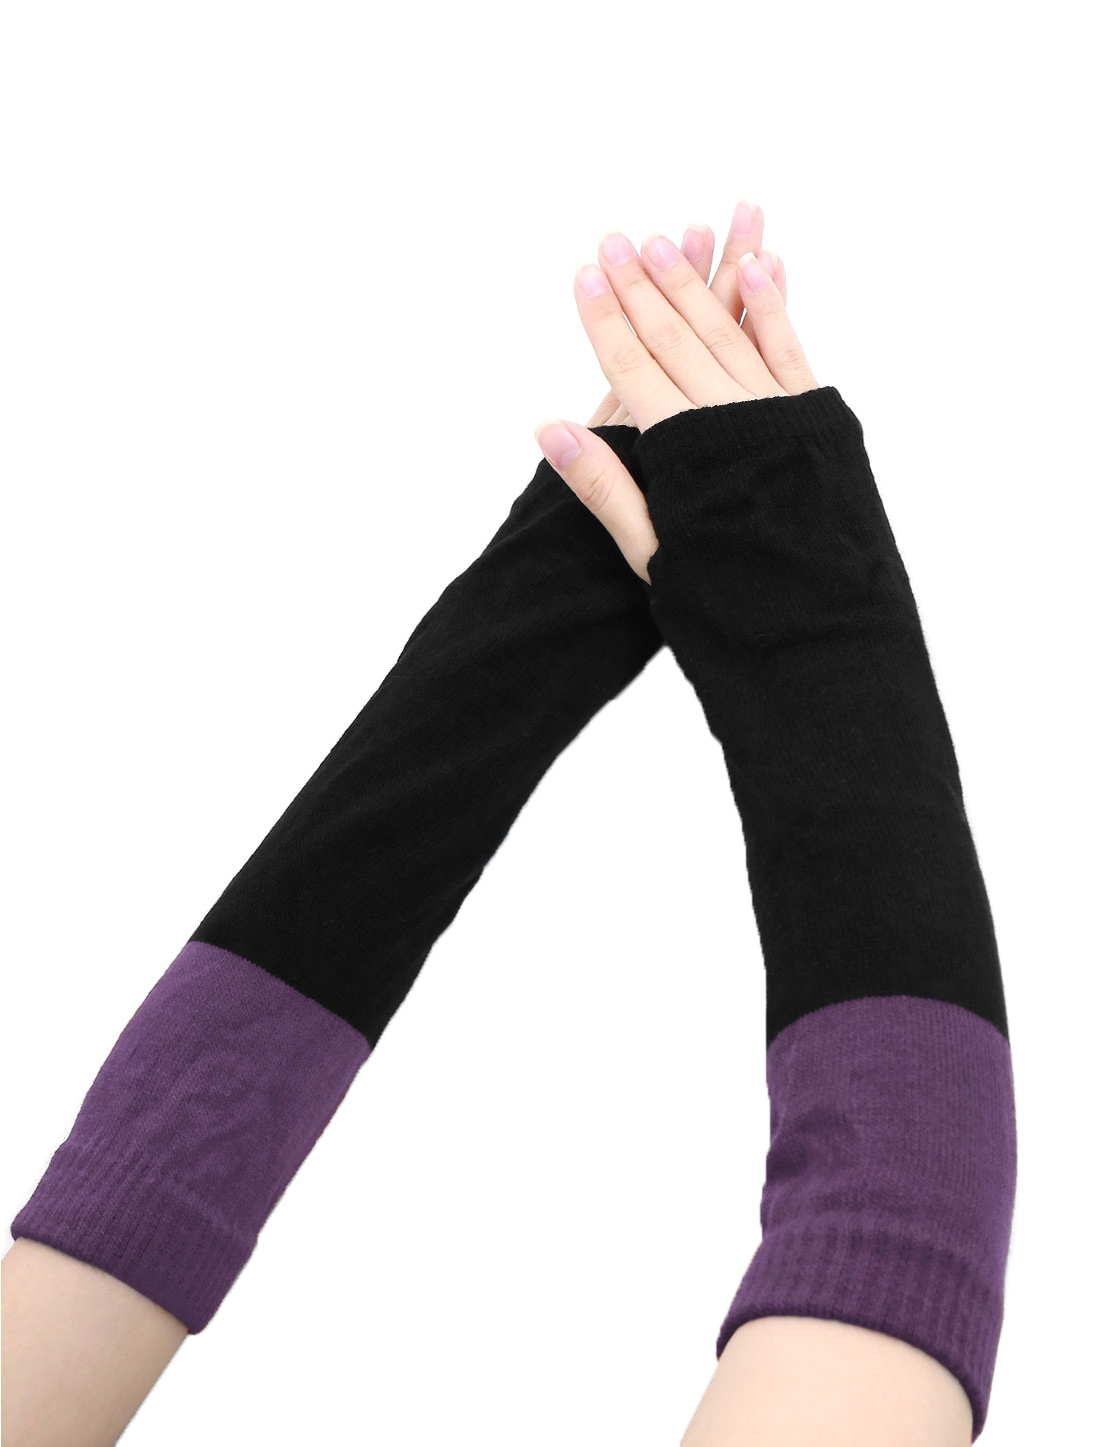 Lady Color Block Knit Fingerless Gloves Pair Purple Black